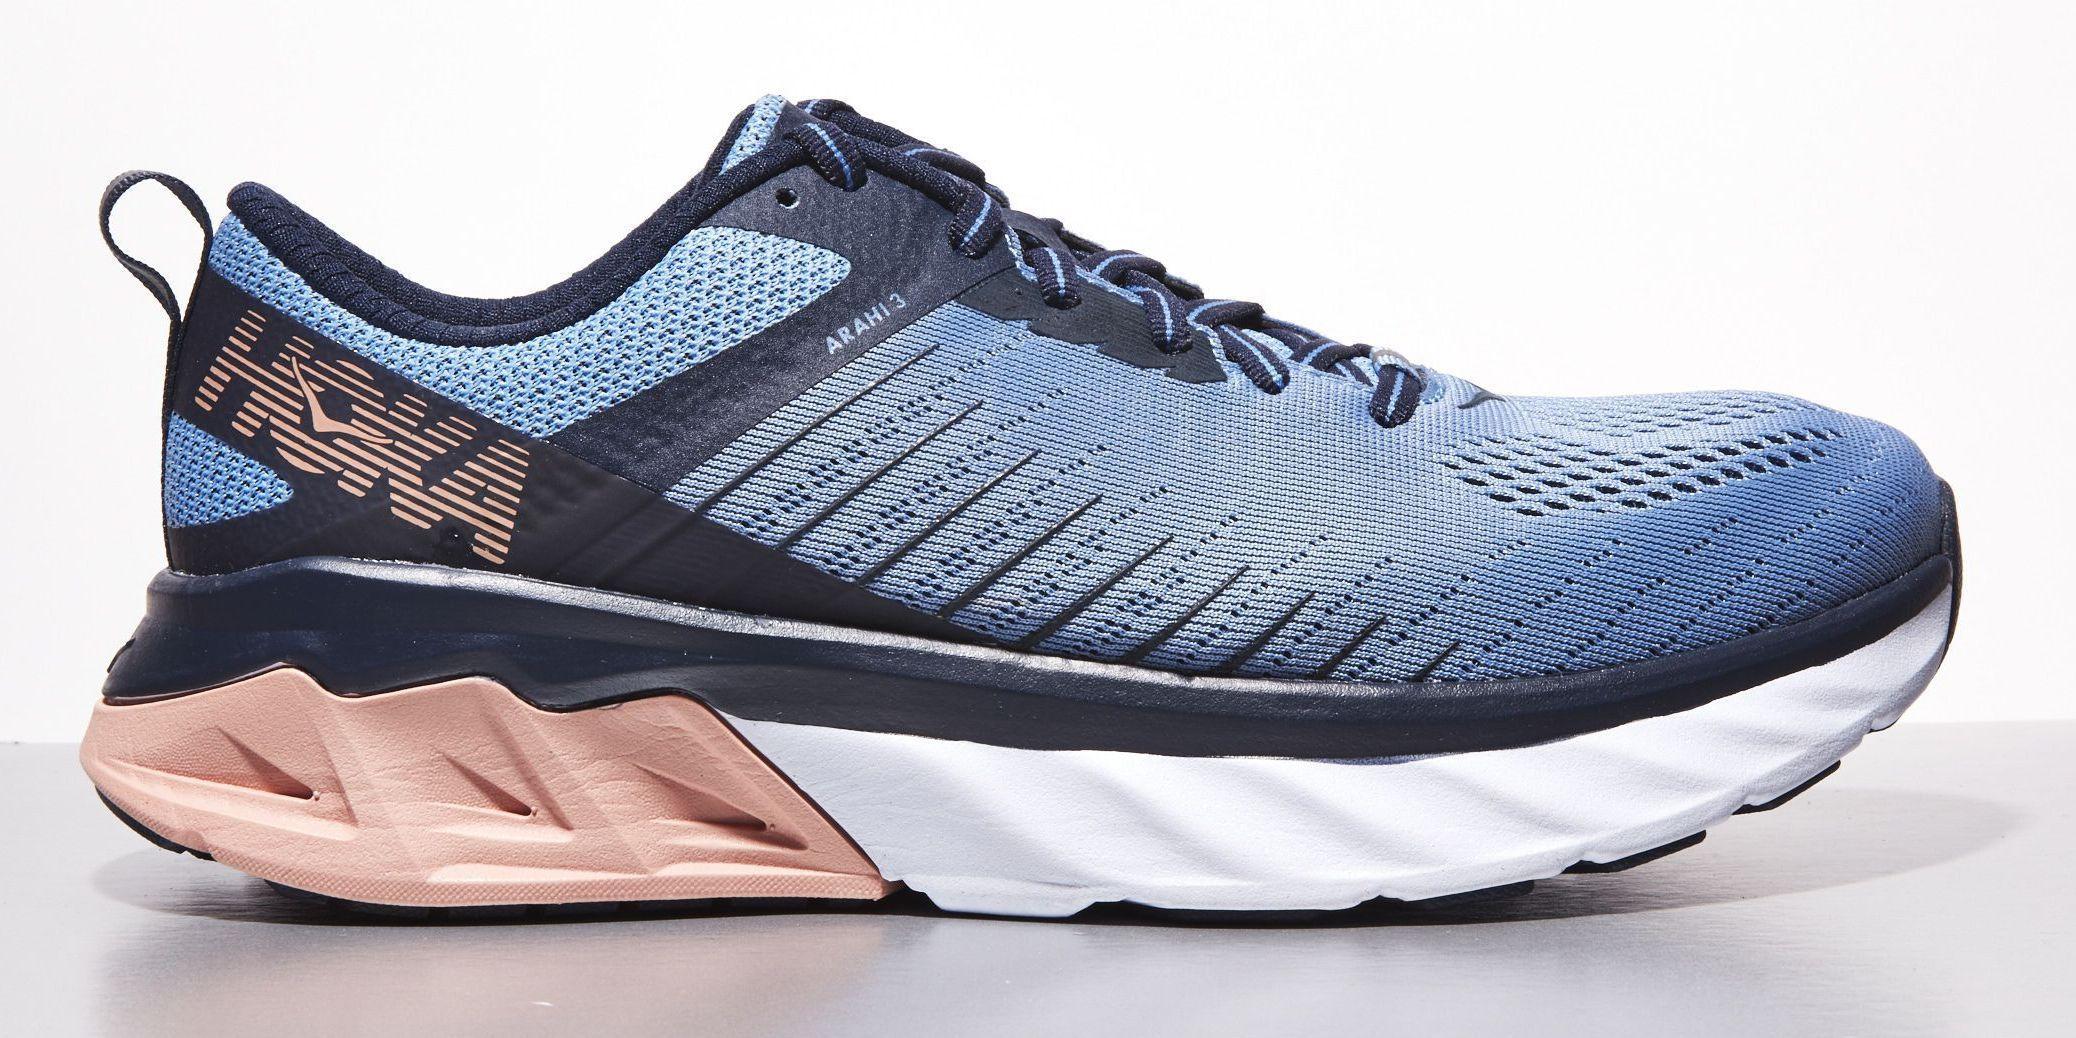 Hoka Running Shoes 2019 | 14 Best Hoka